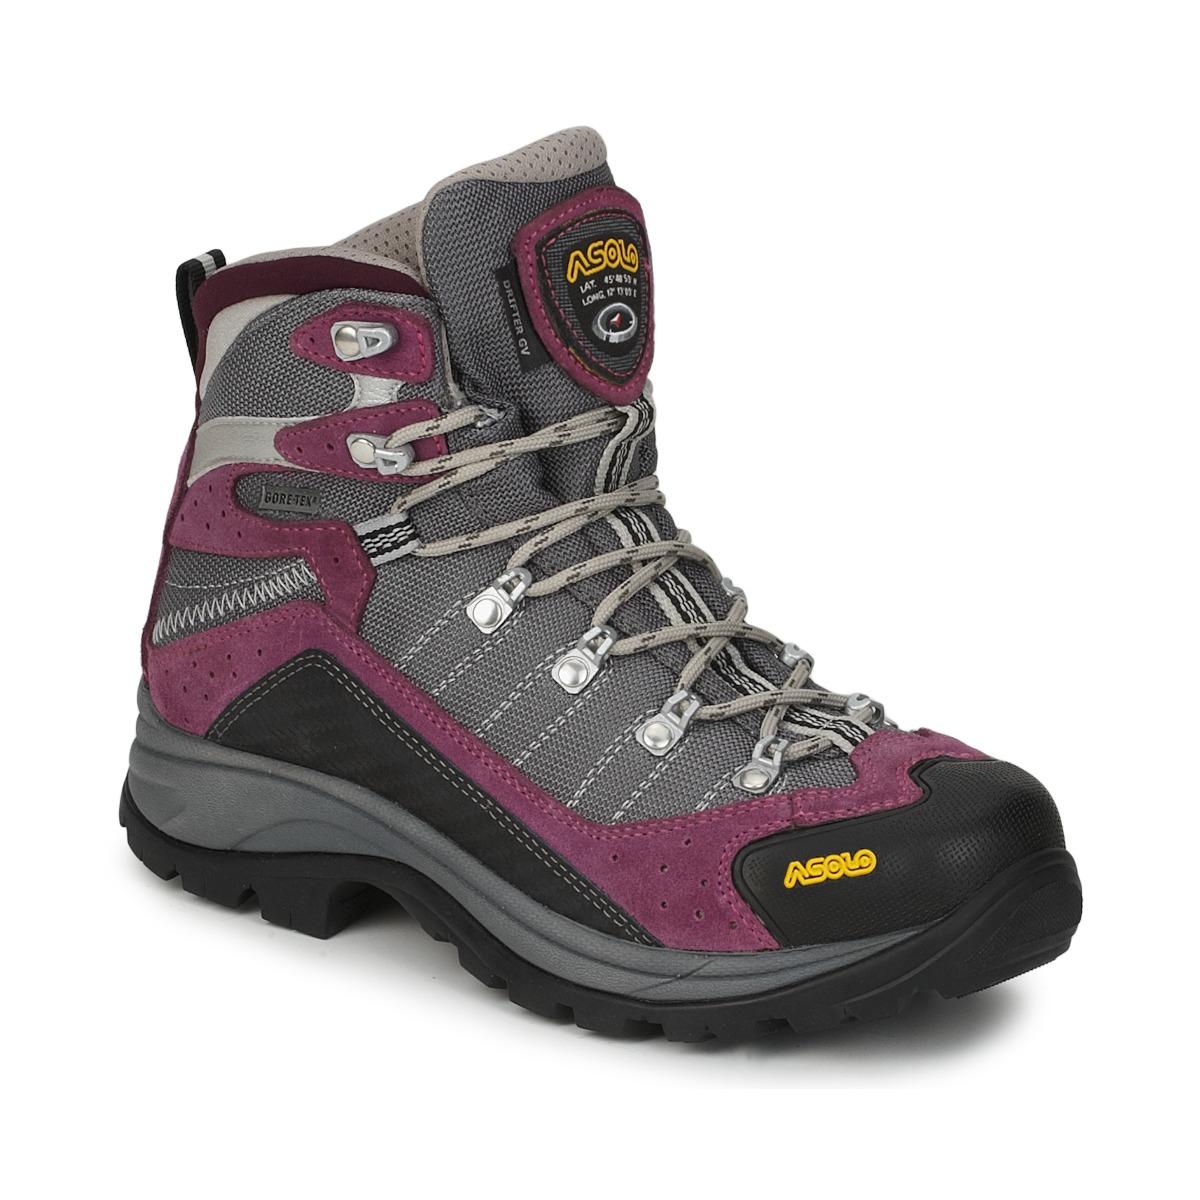 Chaussures-de-randonnee Asolo DRIFTER GV ML Gris / Violet